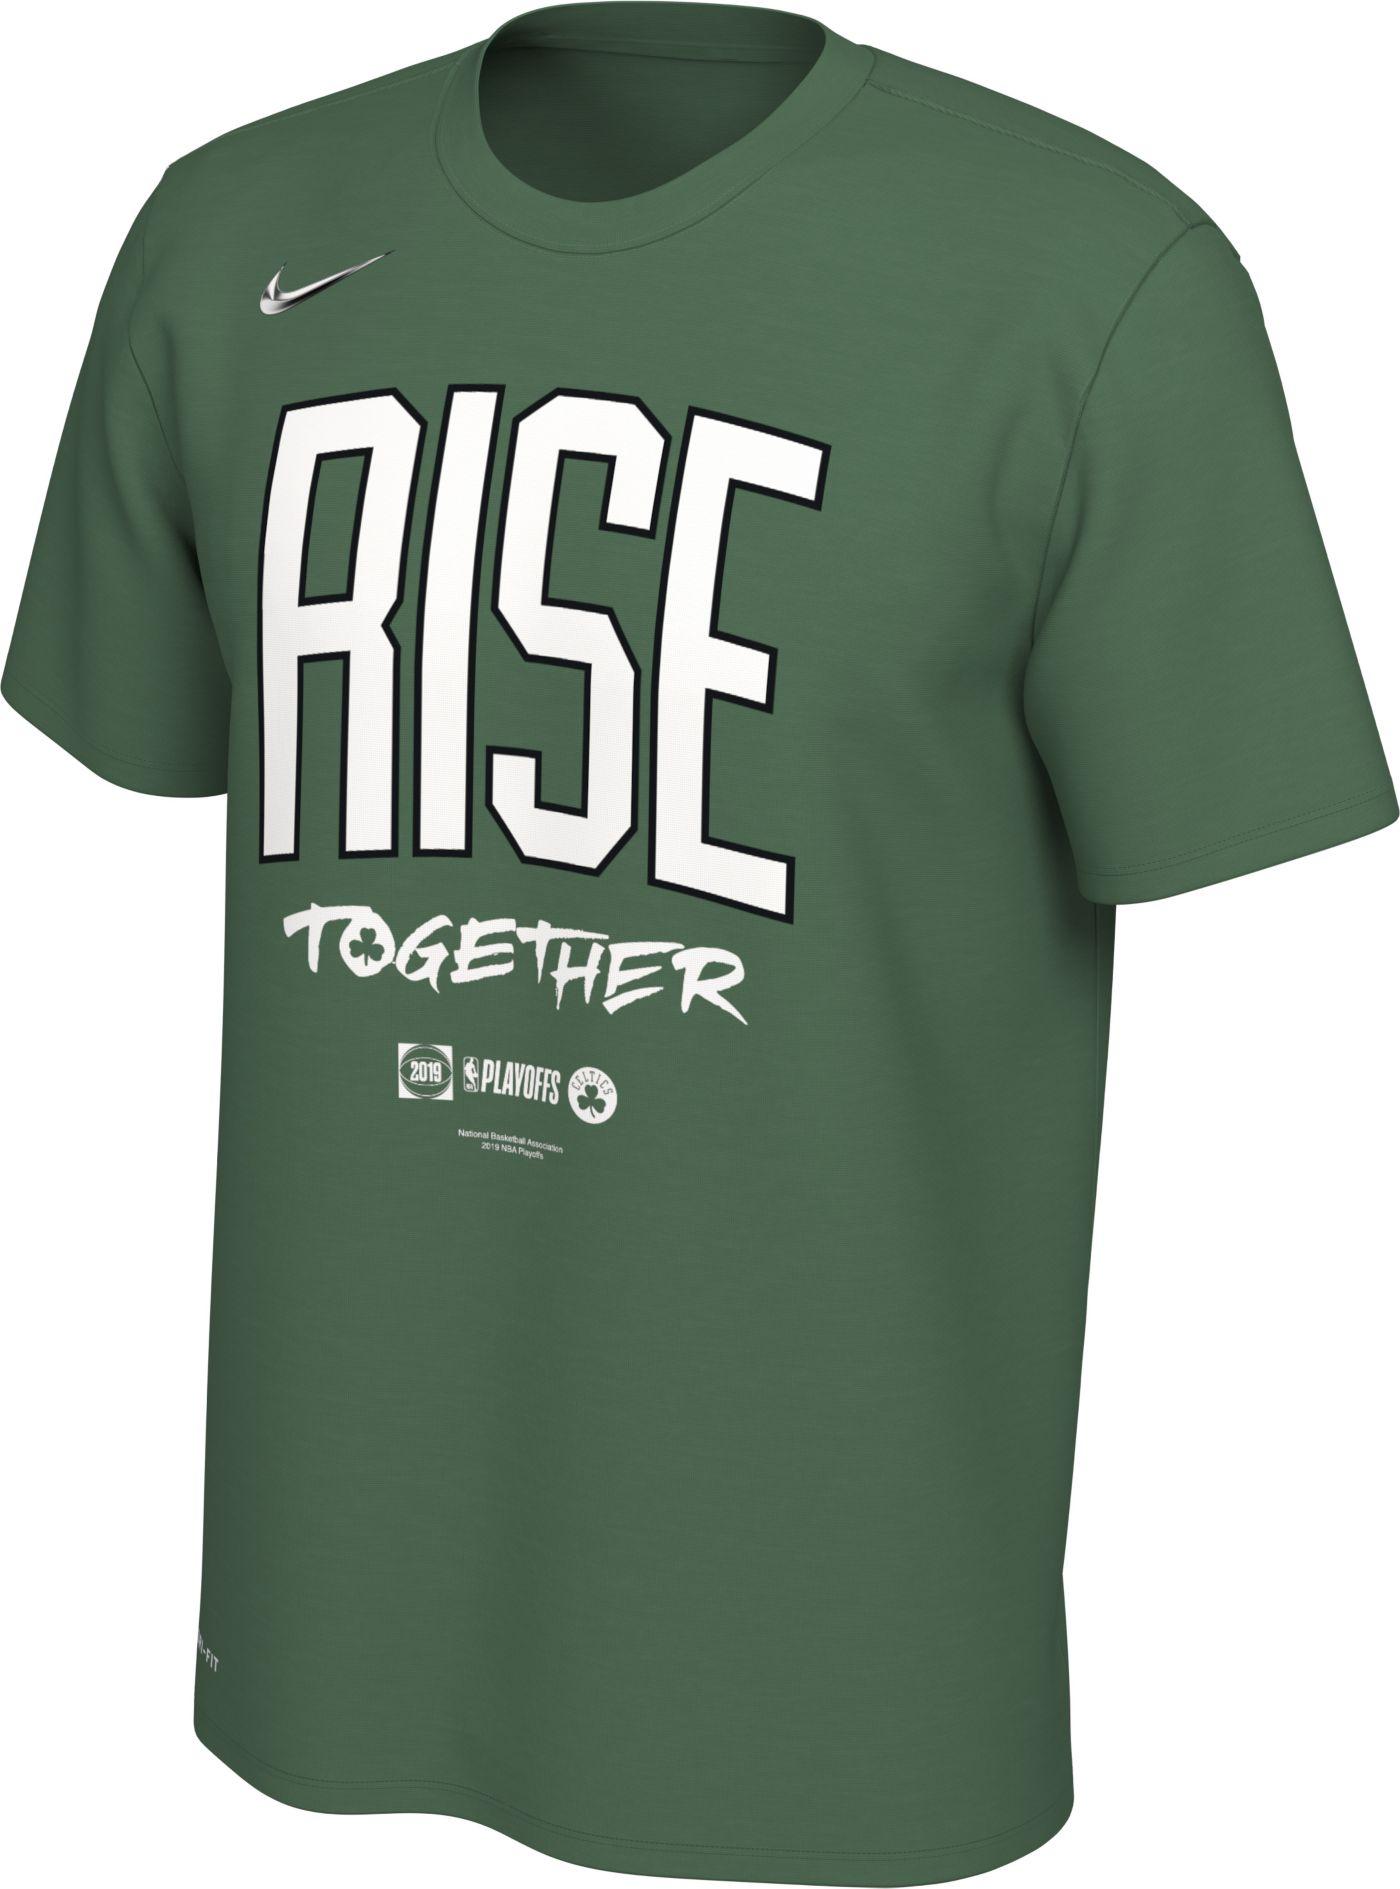 "Nike Men's Boston Celtics 2019 Playoffs ""Rise Together"" Dri-FIT T-Shirt"